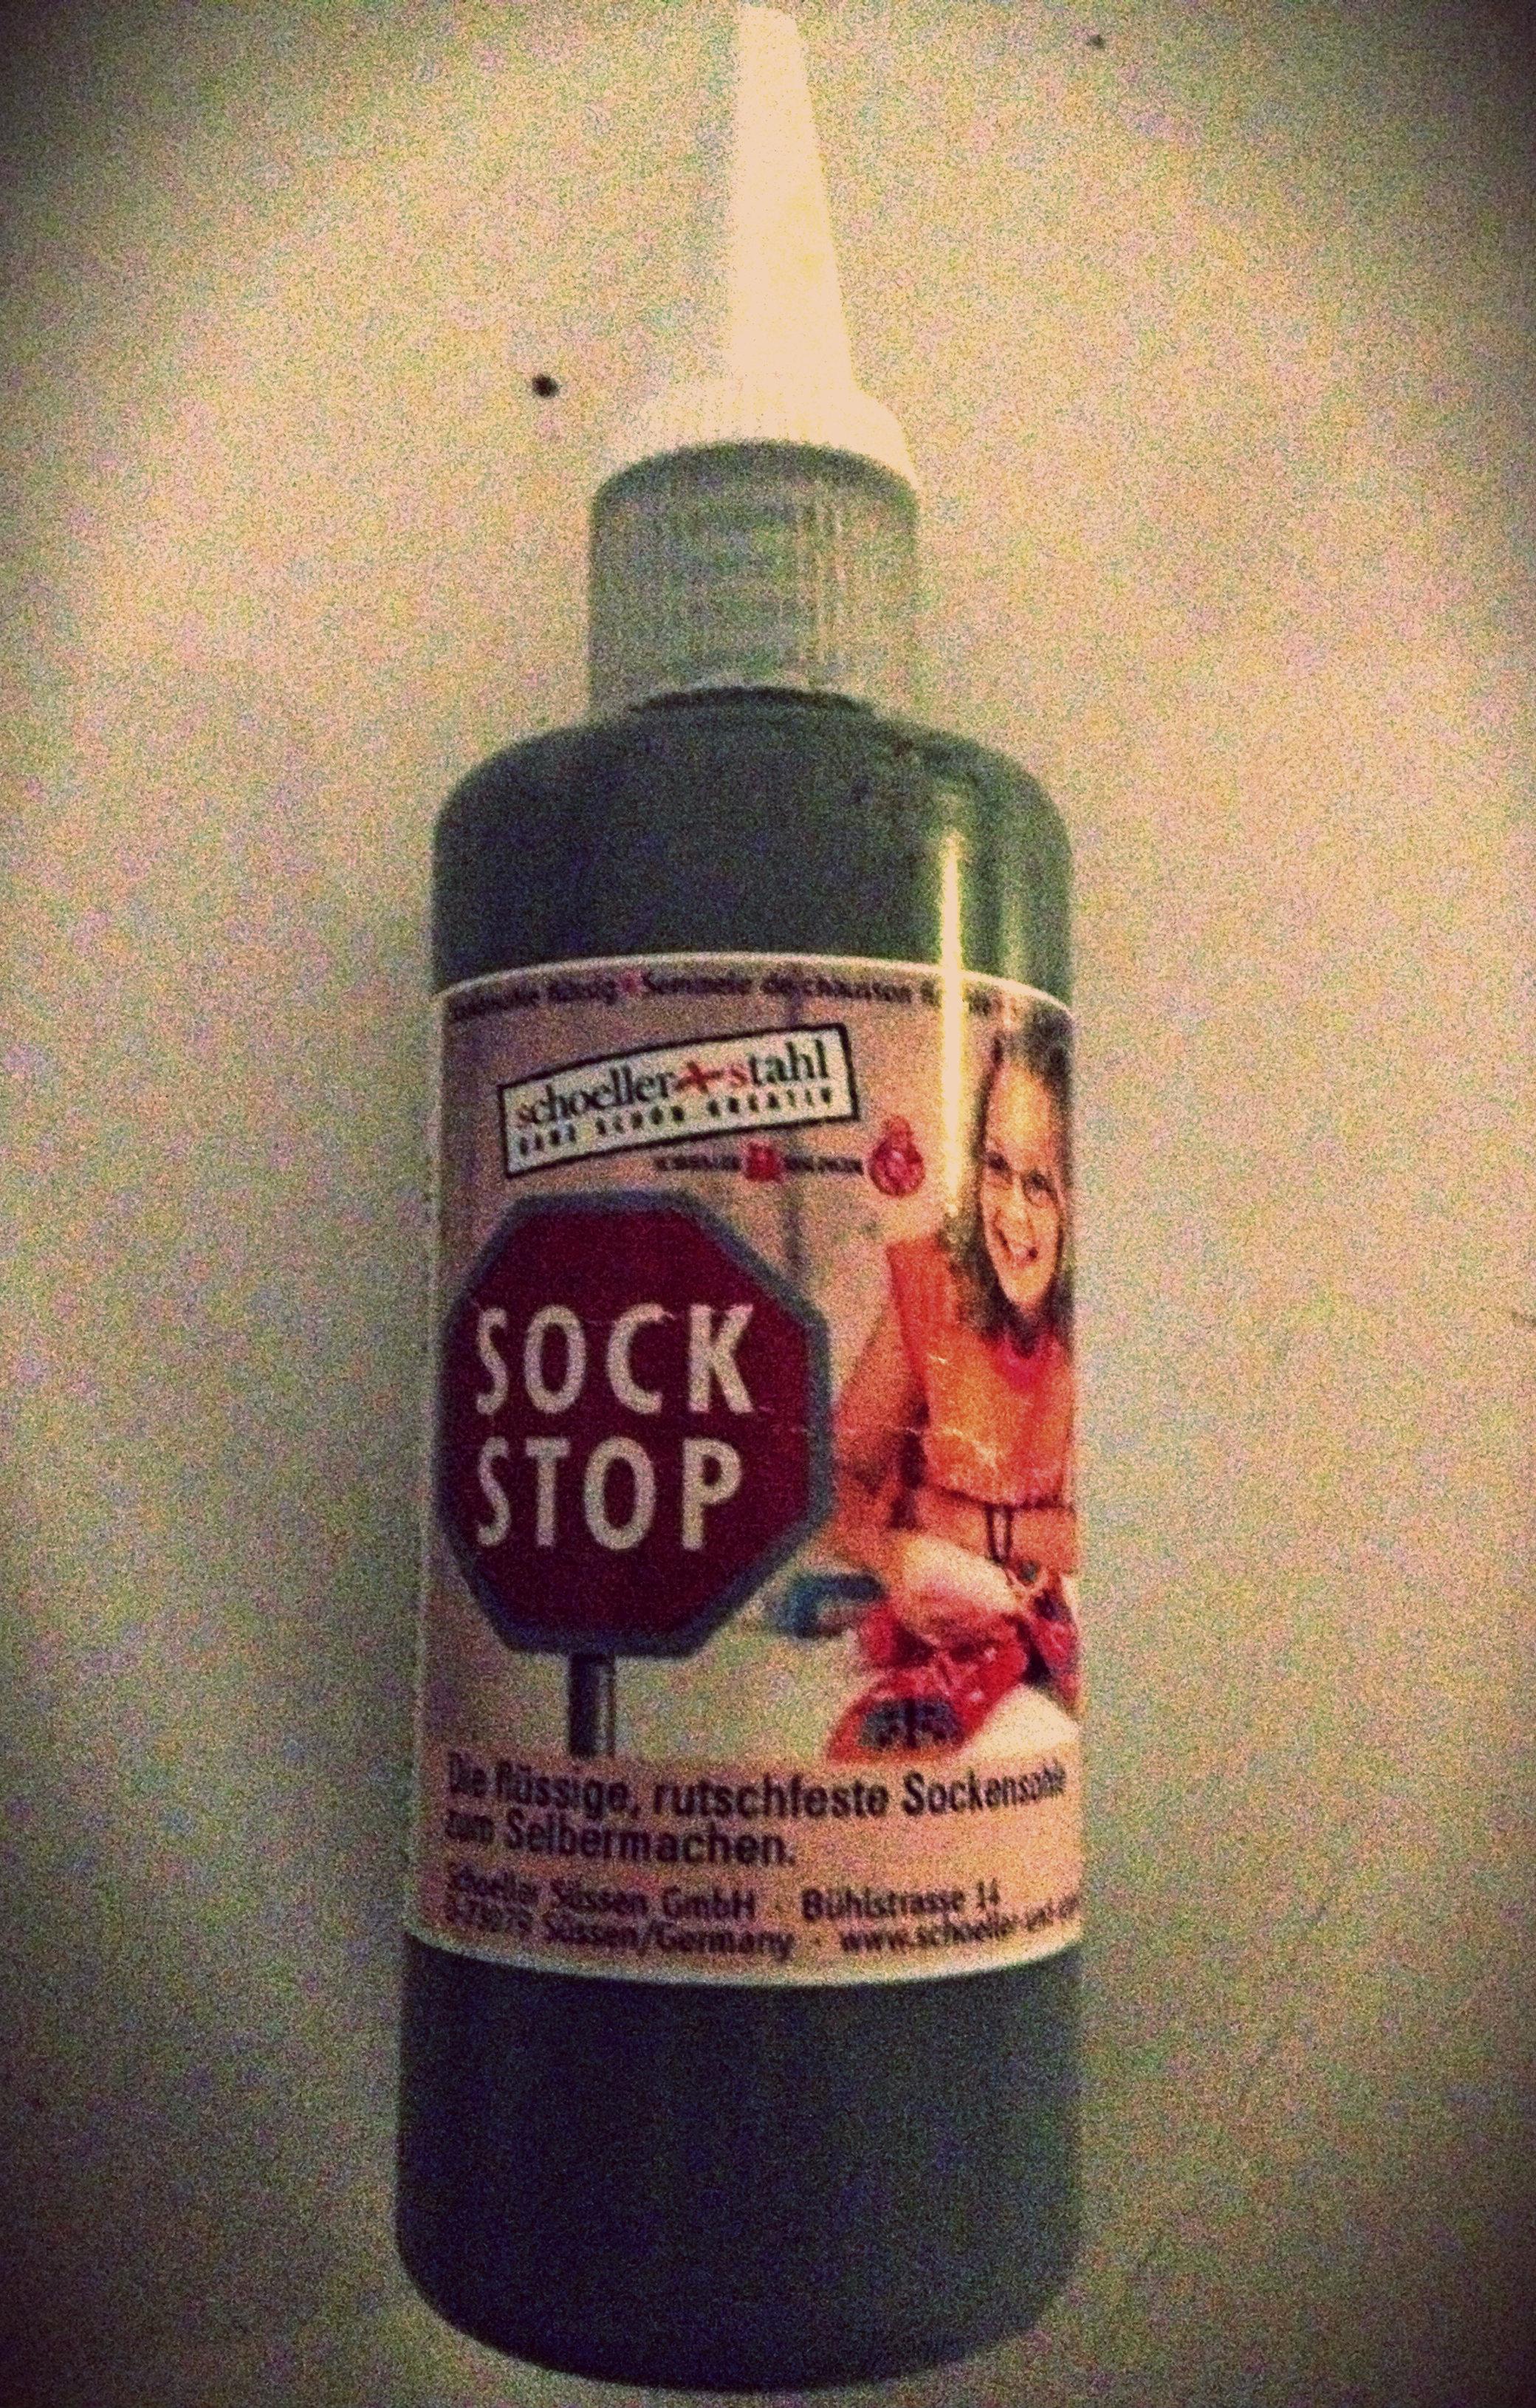 sockStop